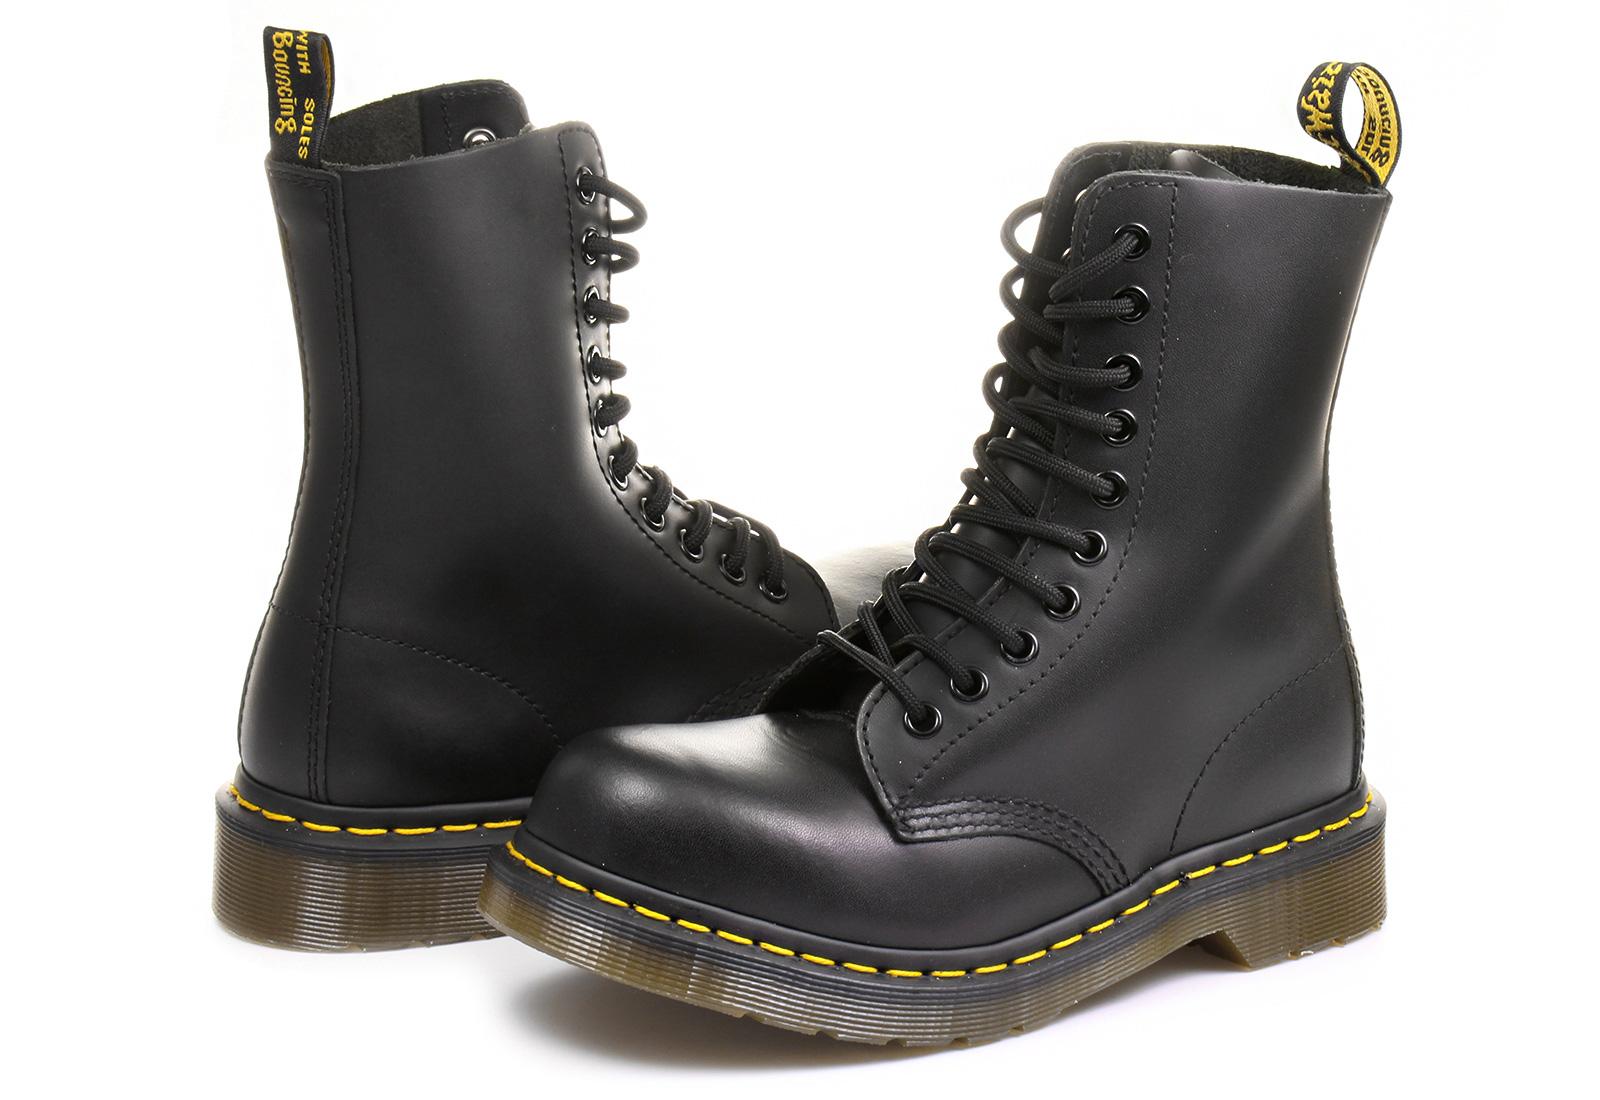 Dr Martens Bakancs - 1919 B-fh - 10105001 - Office Shoes Magyarország 9905b8e525